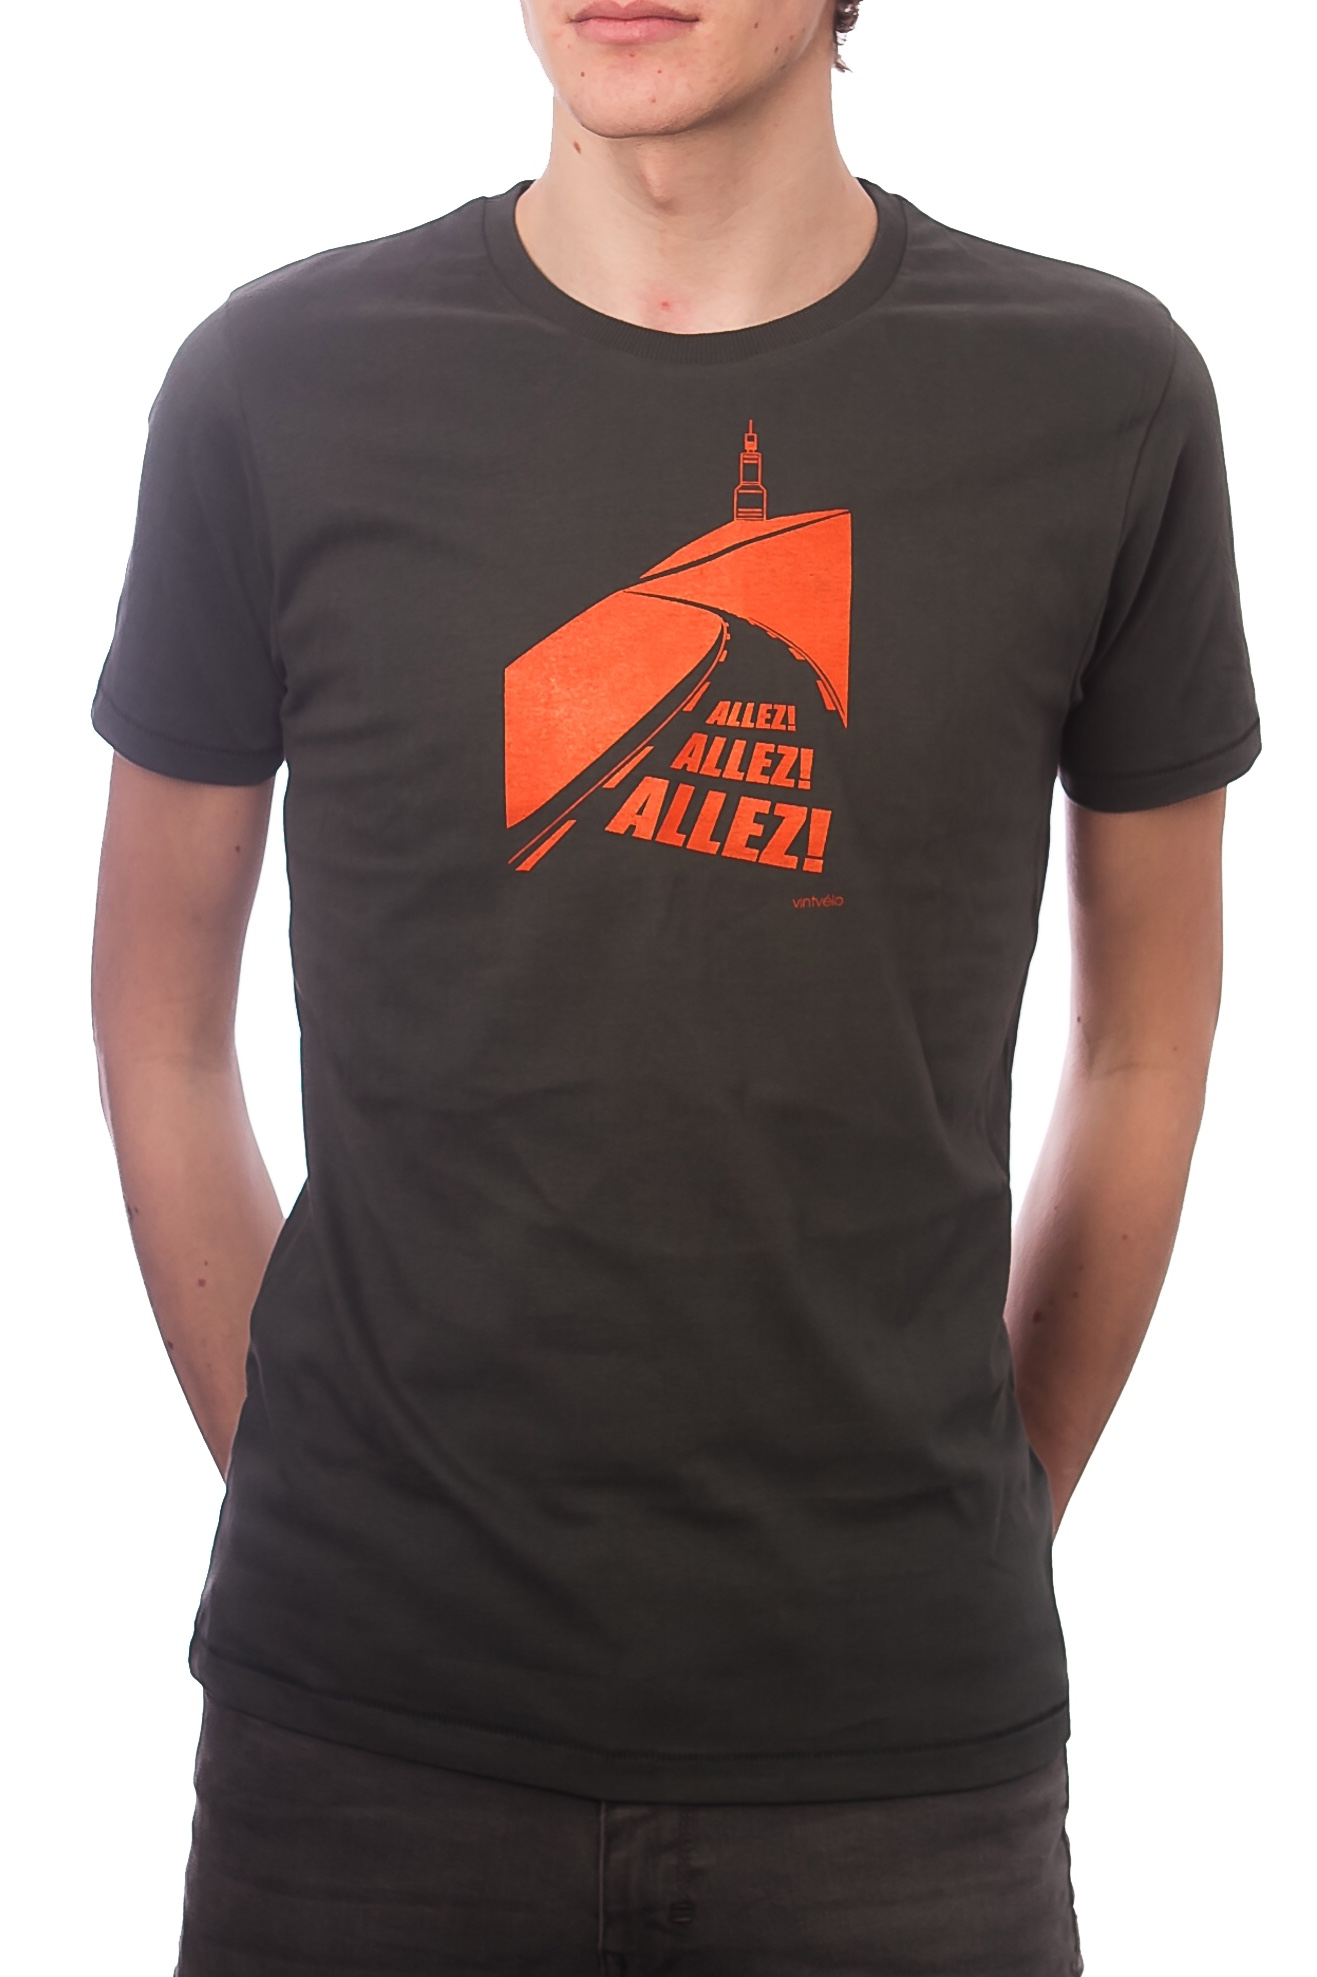 b3b15087 Men's cycling T-shirt – Mont Ventoux – Jersey cotton – vintvélo